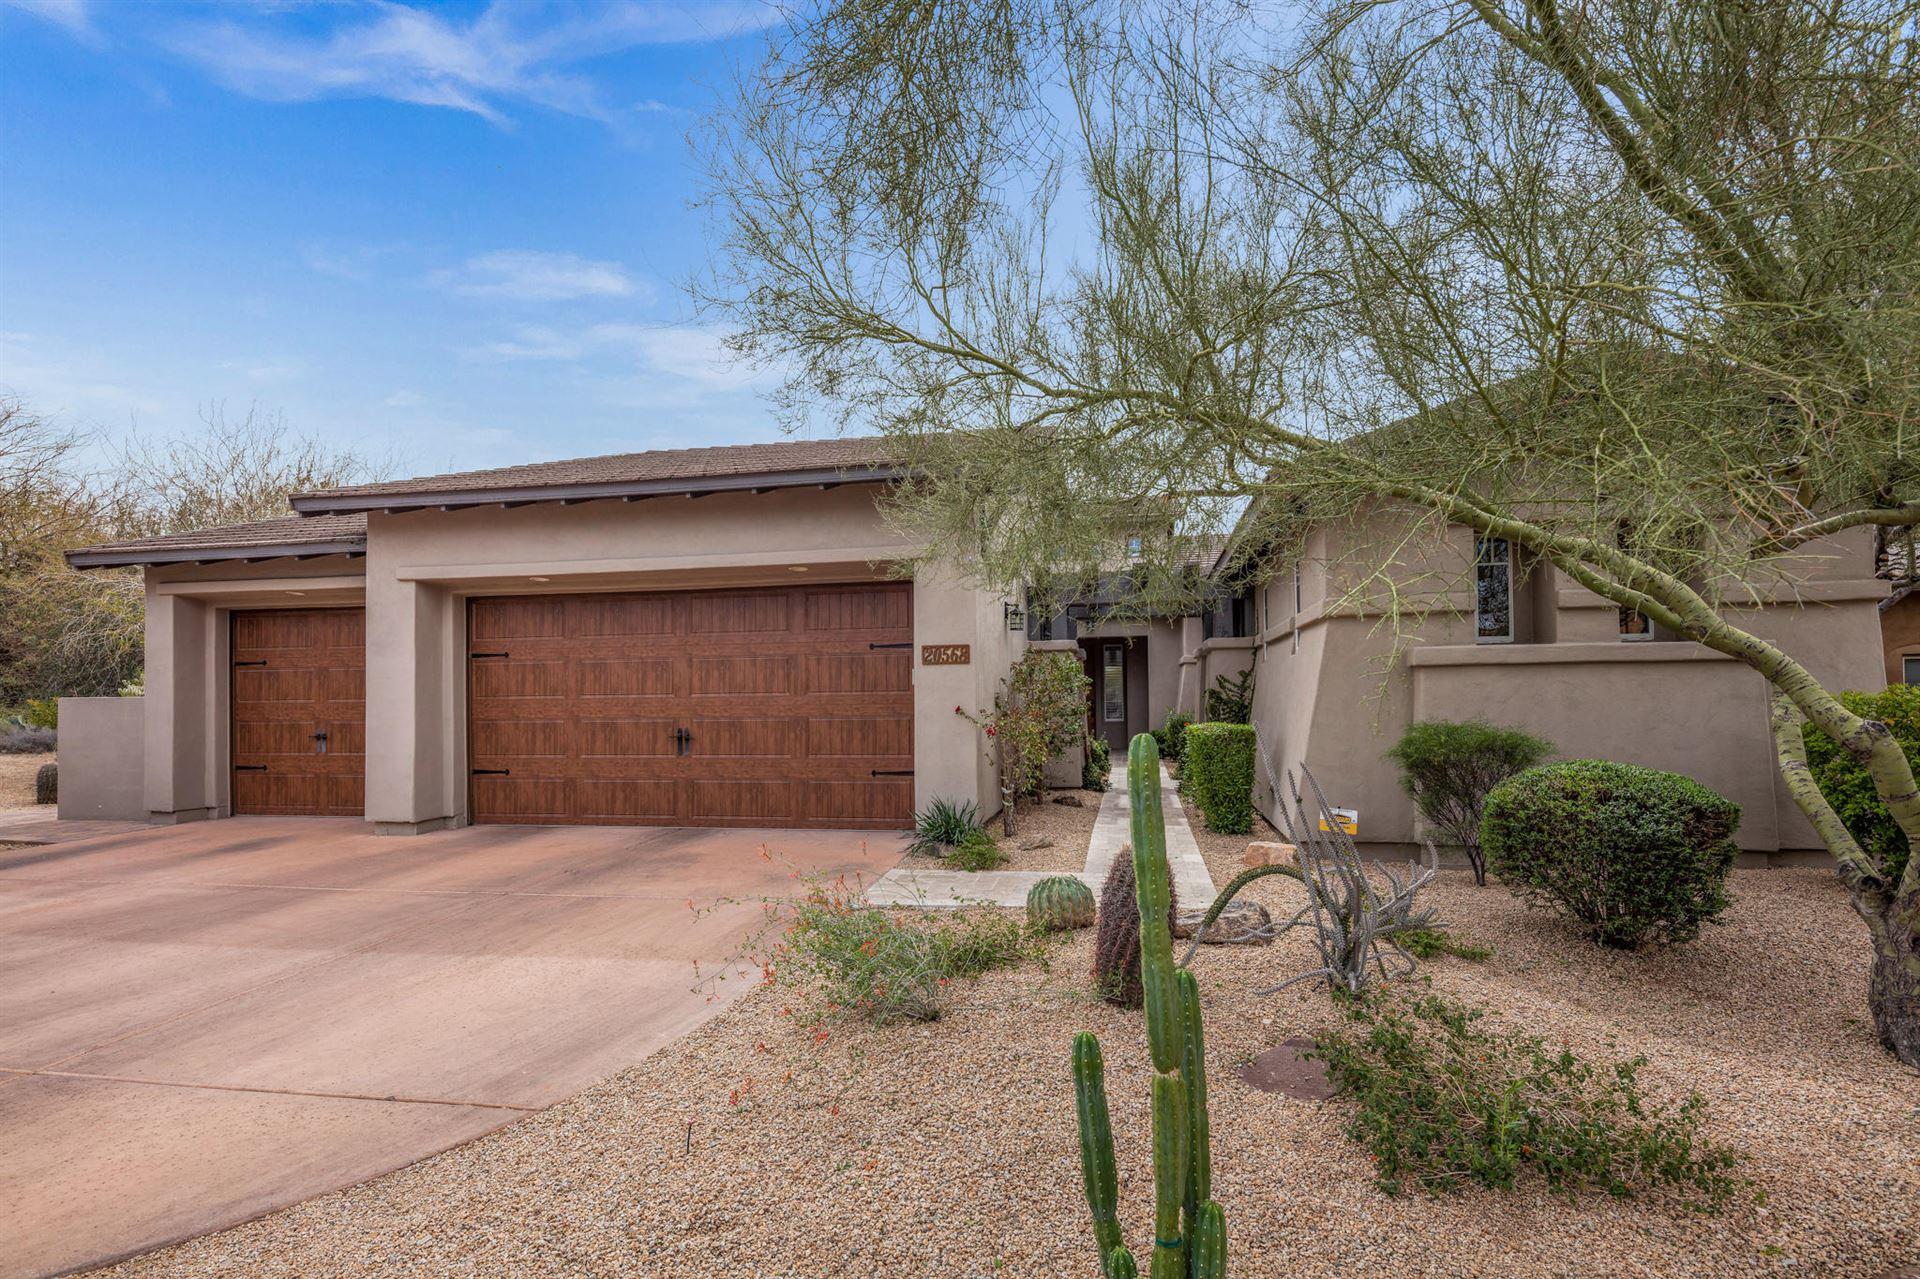 Photo of 20568 N 93 Place, Scottsdale, AZ 85255 (MLS # 6213875)